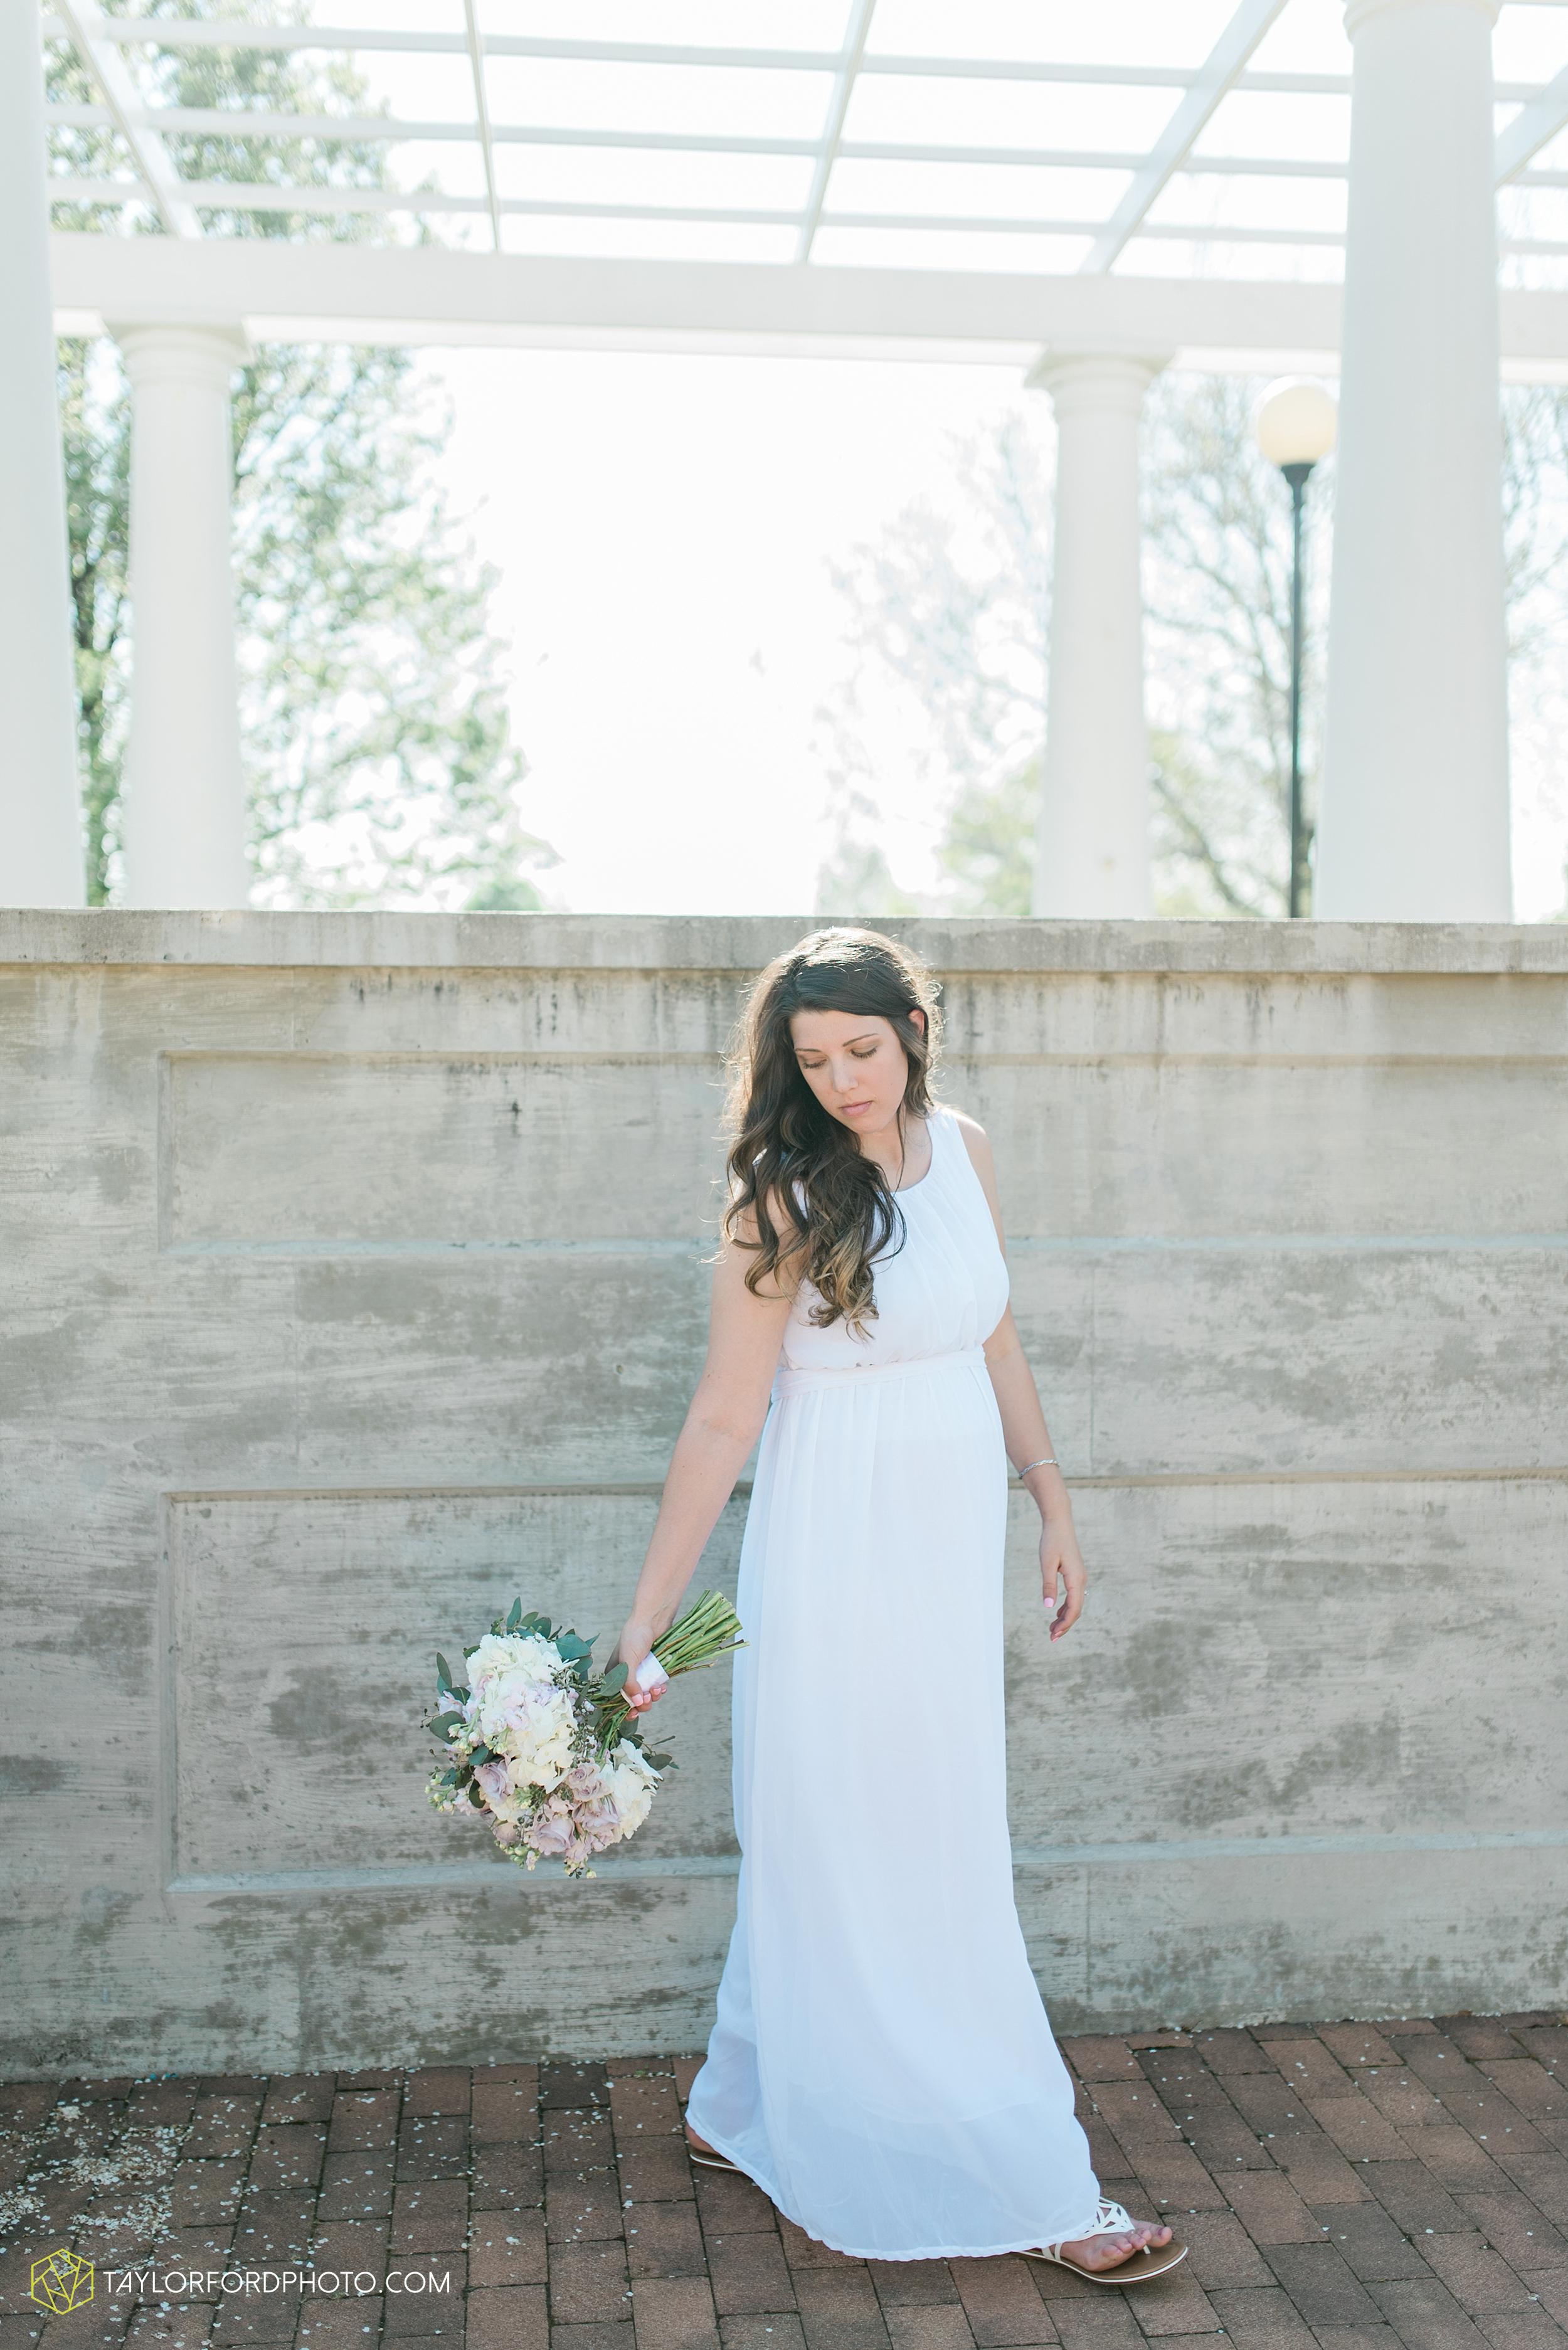 lakeside-rose-gardens-fort-wayne-indiana-elopement-wedding-photographer-Taylor-Ford-Photography_7161.jpg